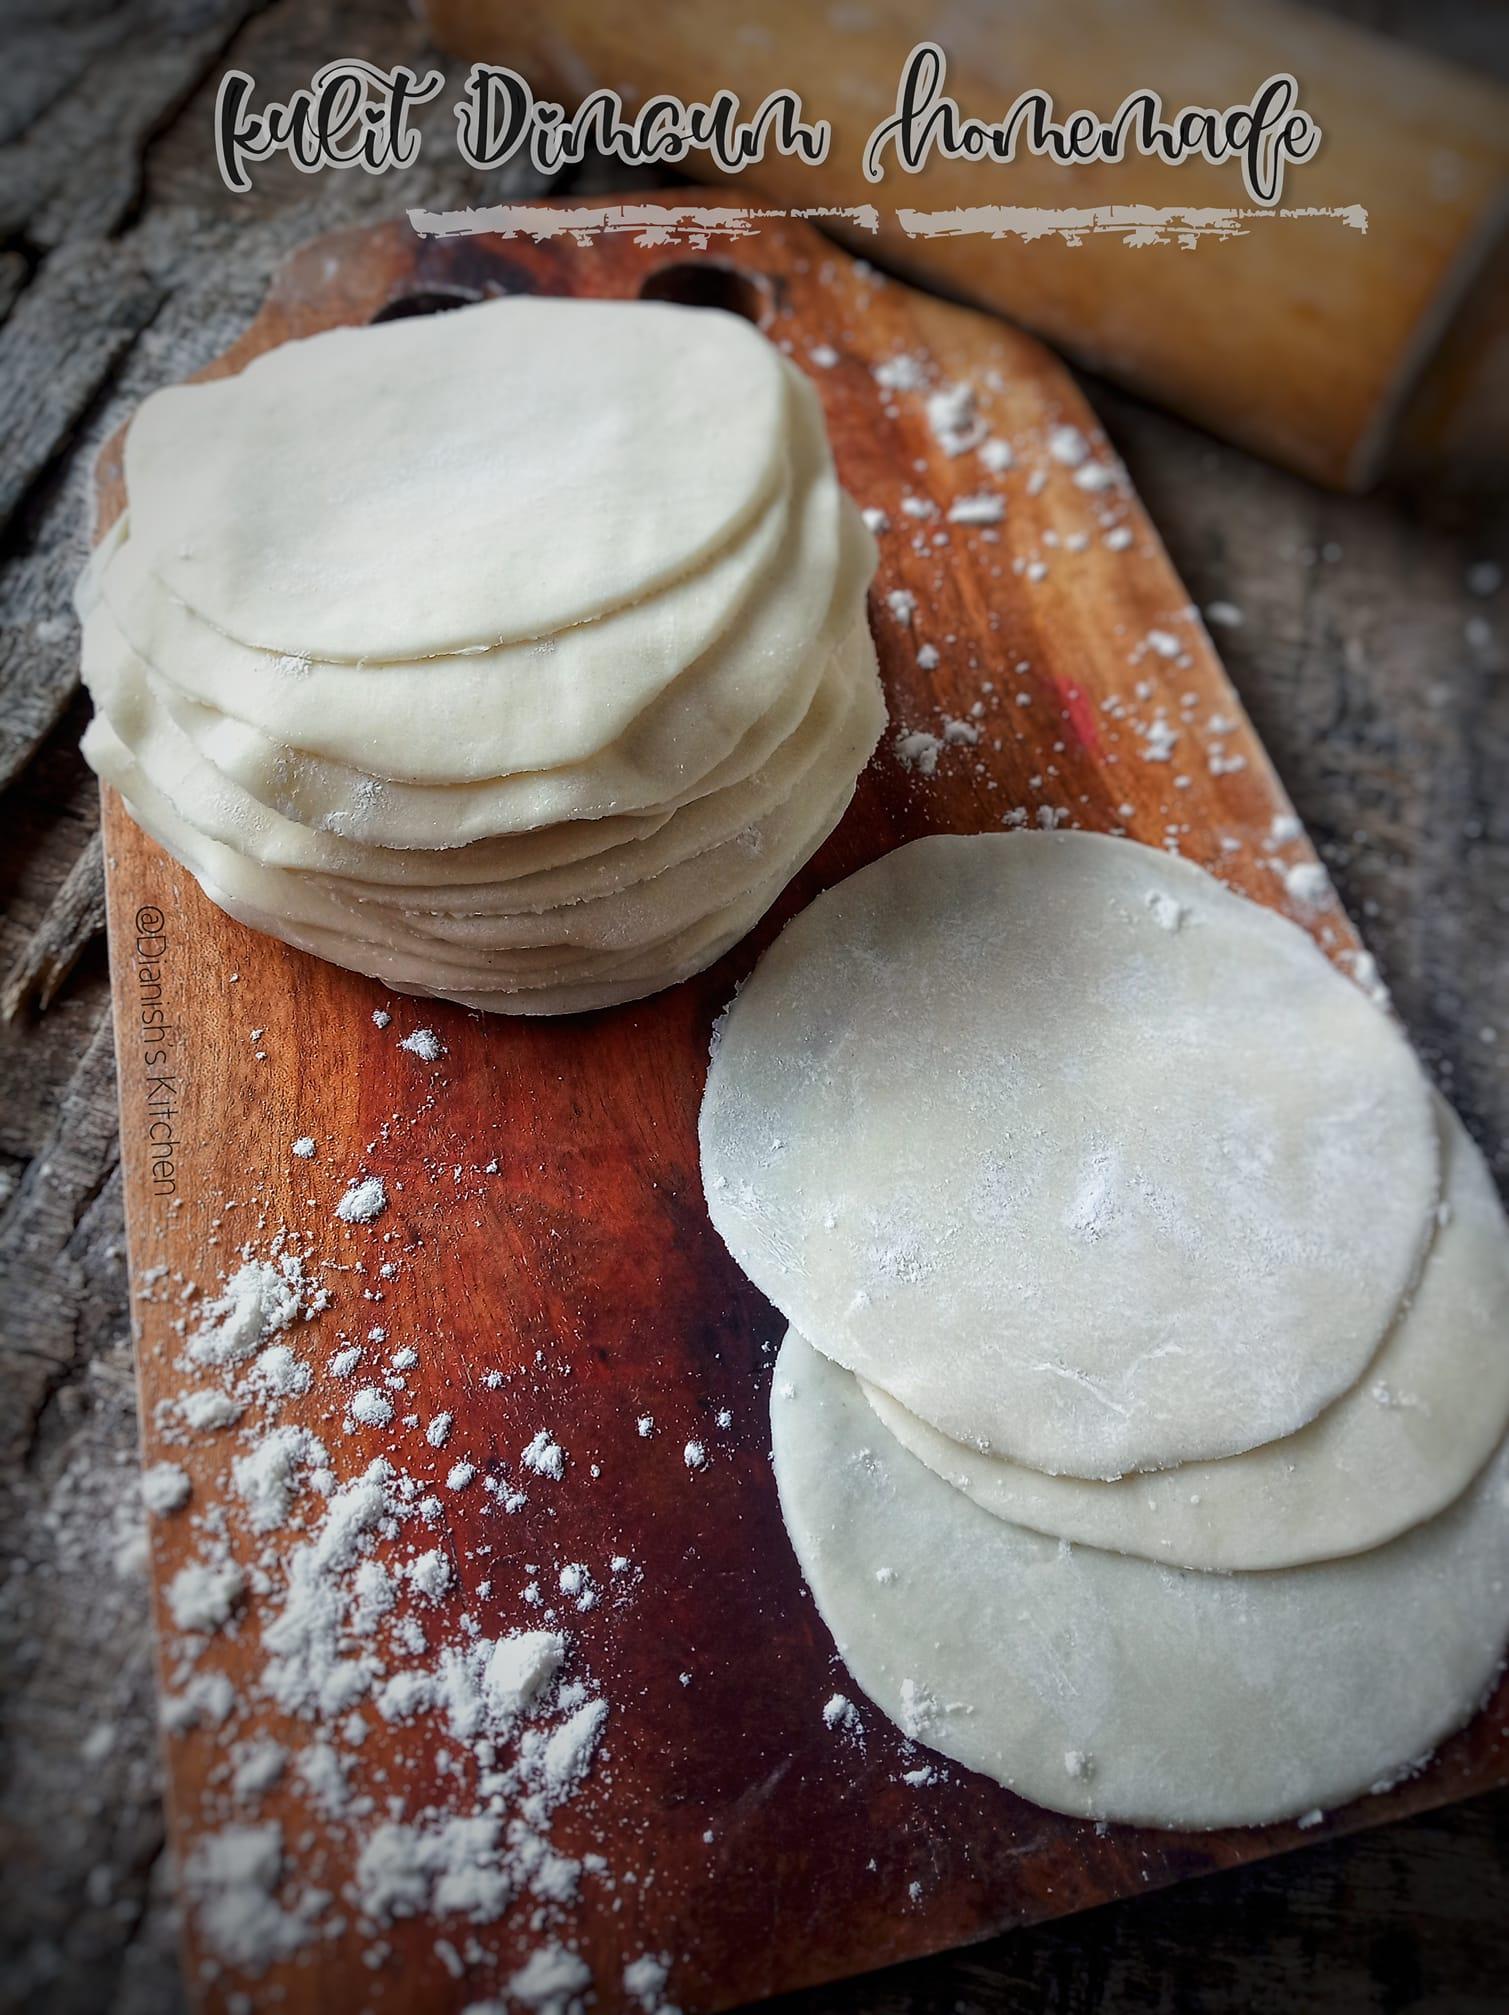 KULIT DIMSUM HOMEMADE by Dianish's Kitchen